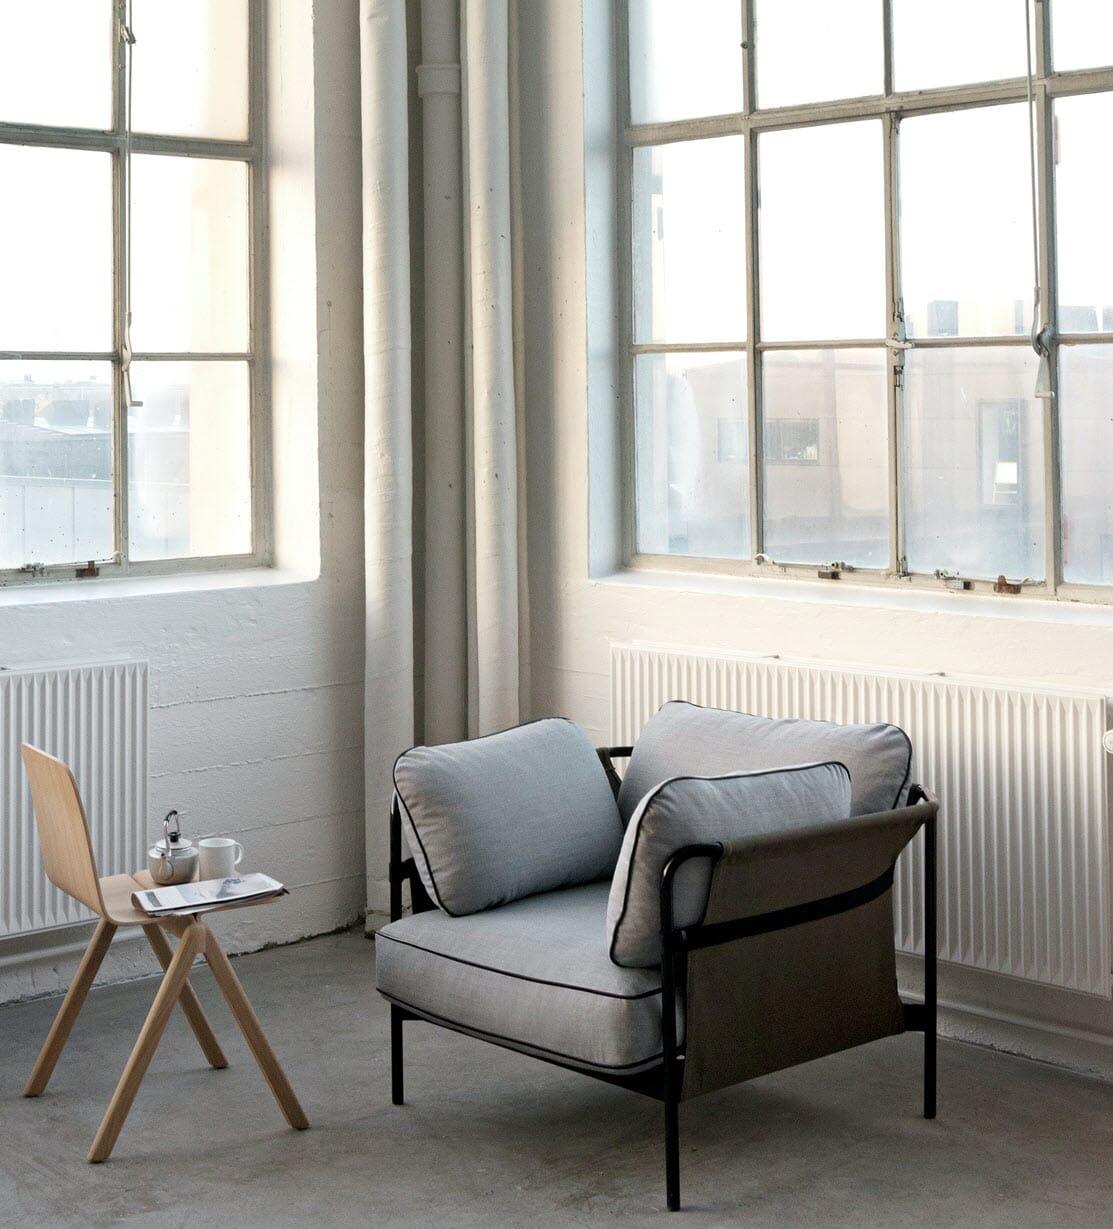 Interir Nettbutikk. Affordable Kompaktowa Lampa Wiszca Kaylee With Sia Interir Nettbutikk With ...